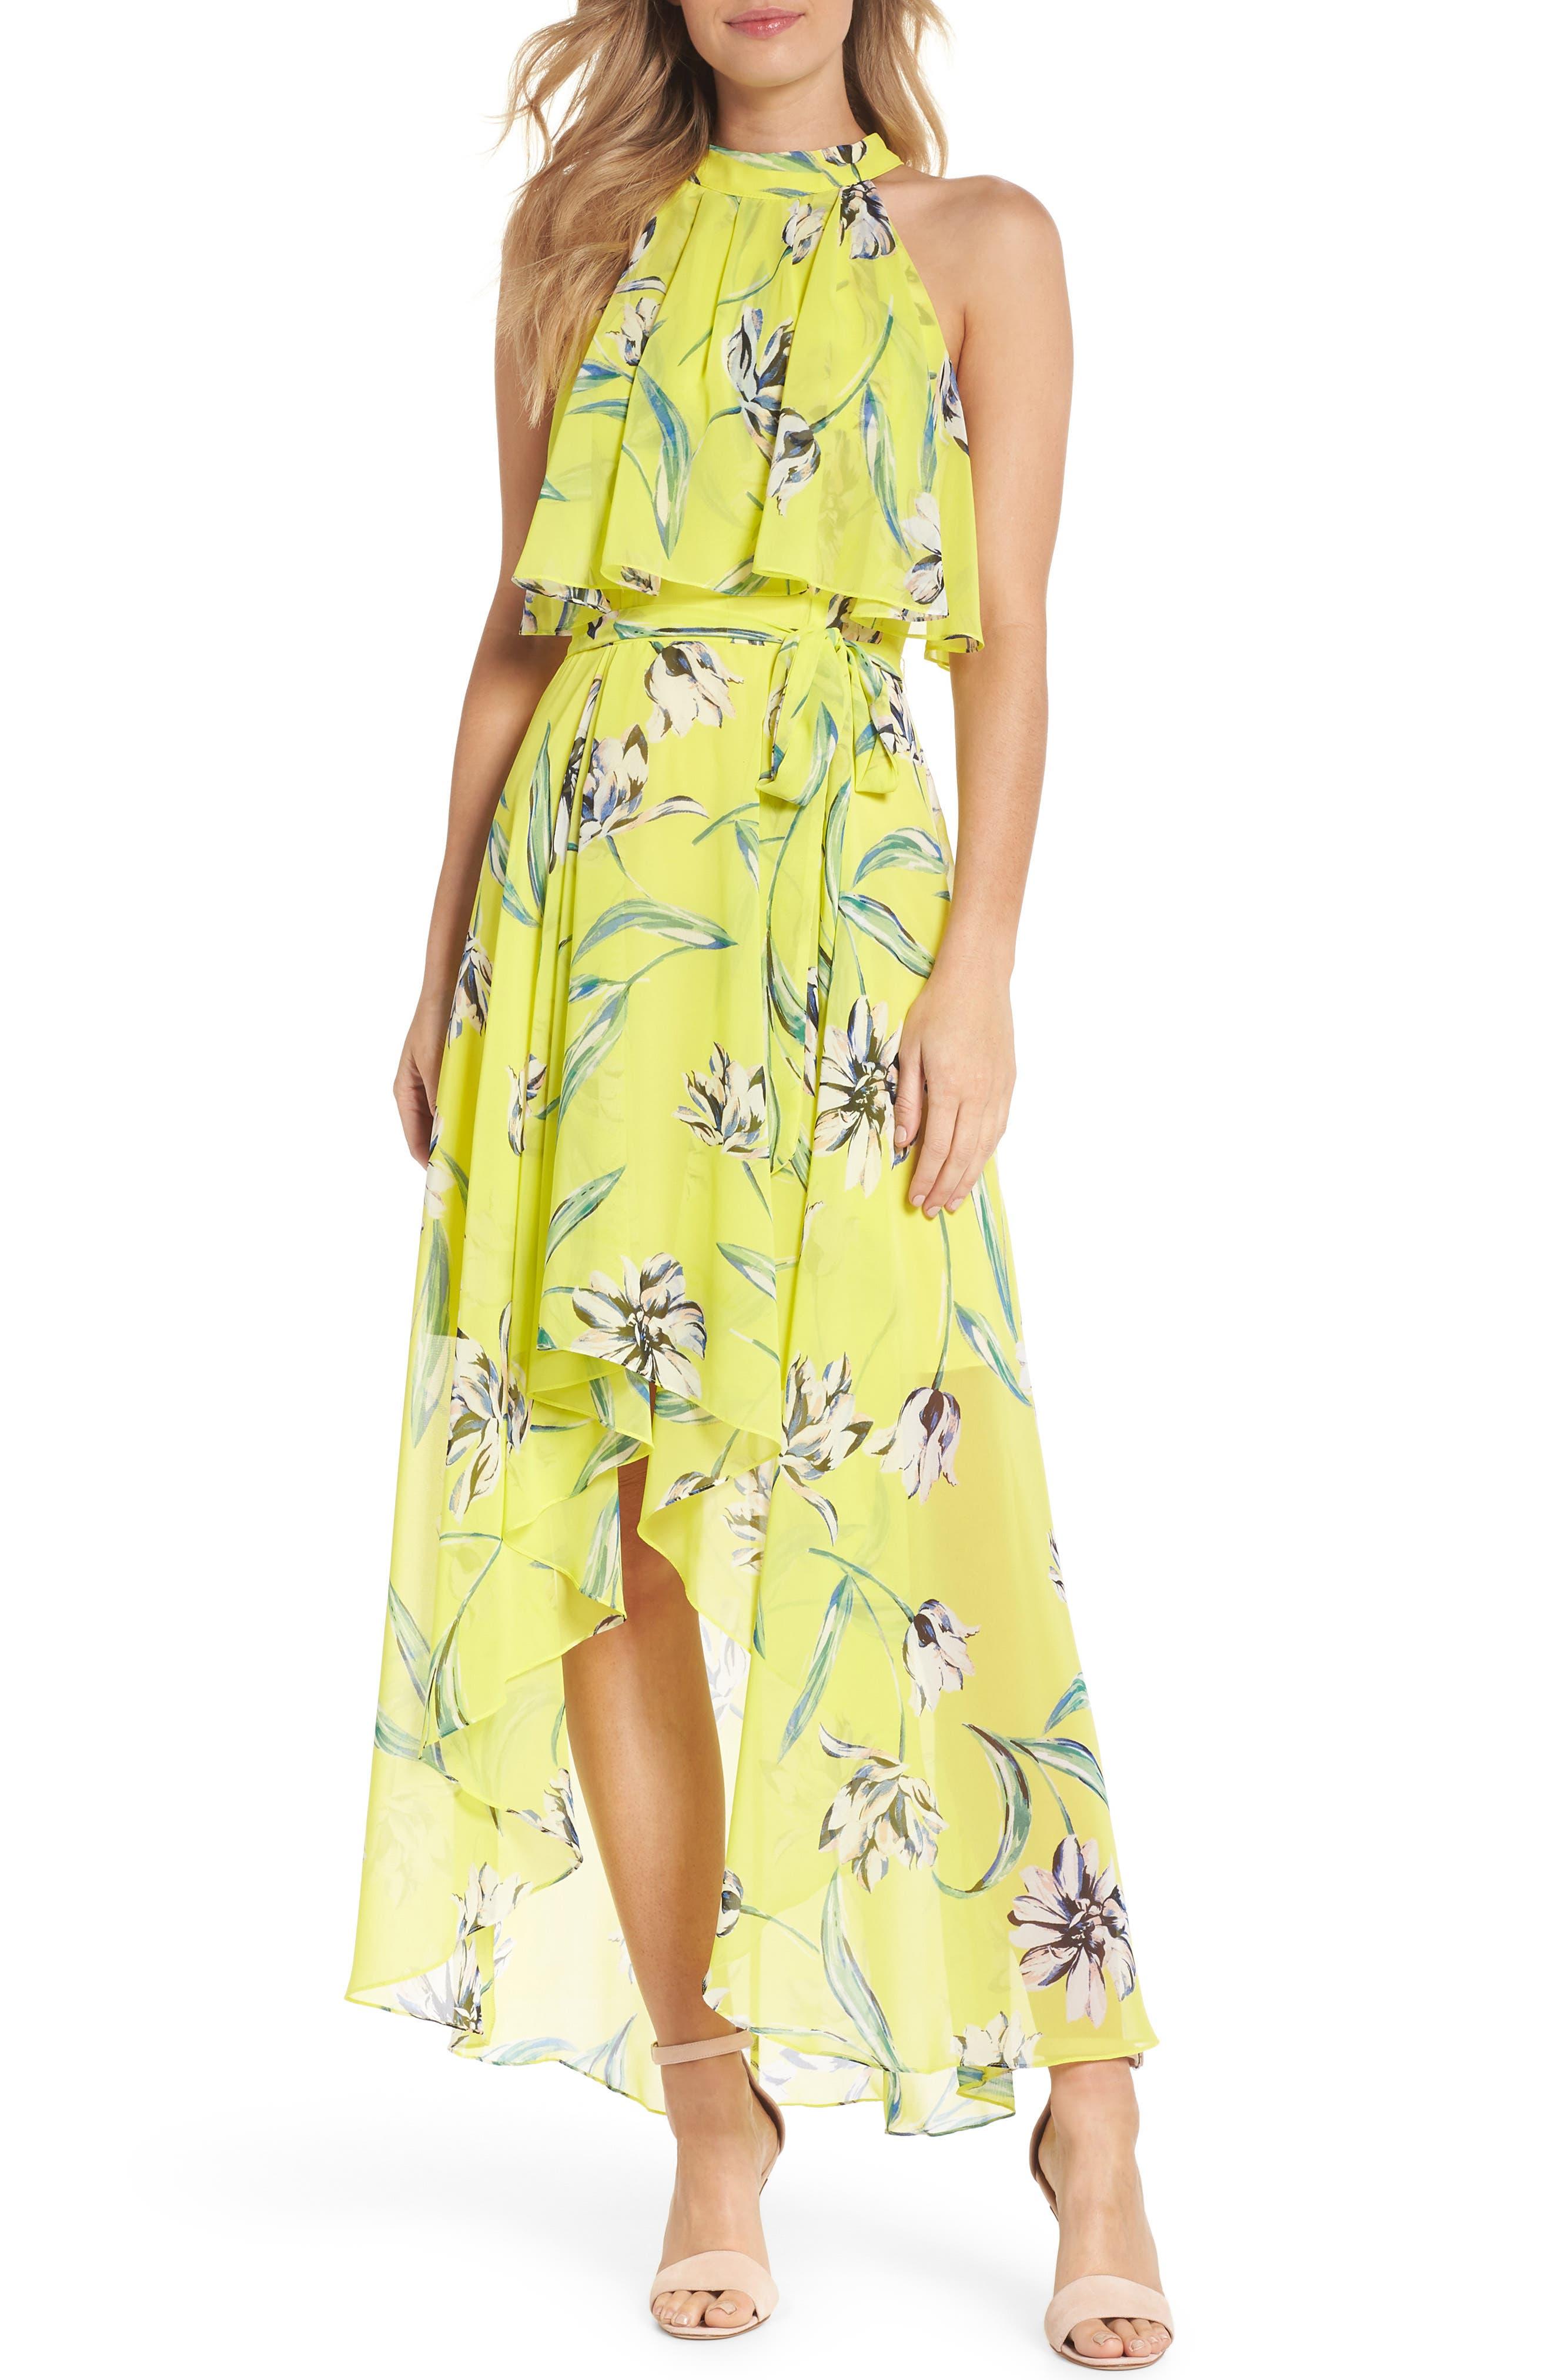 ELIZA J, Halter Neck Chiffon Maxi Dress, Main thumbnail 1, color, 720